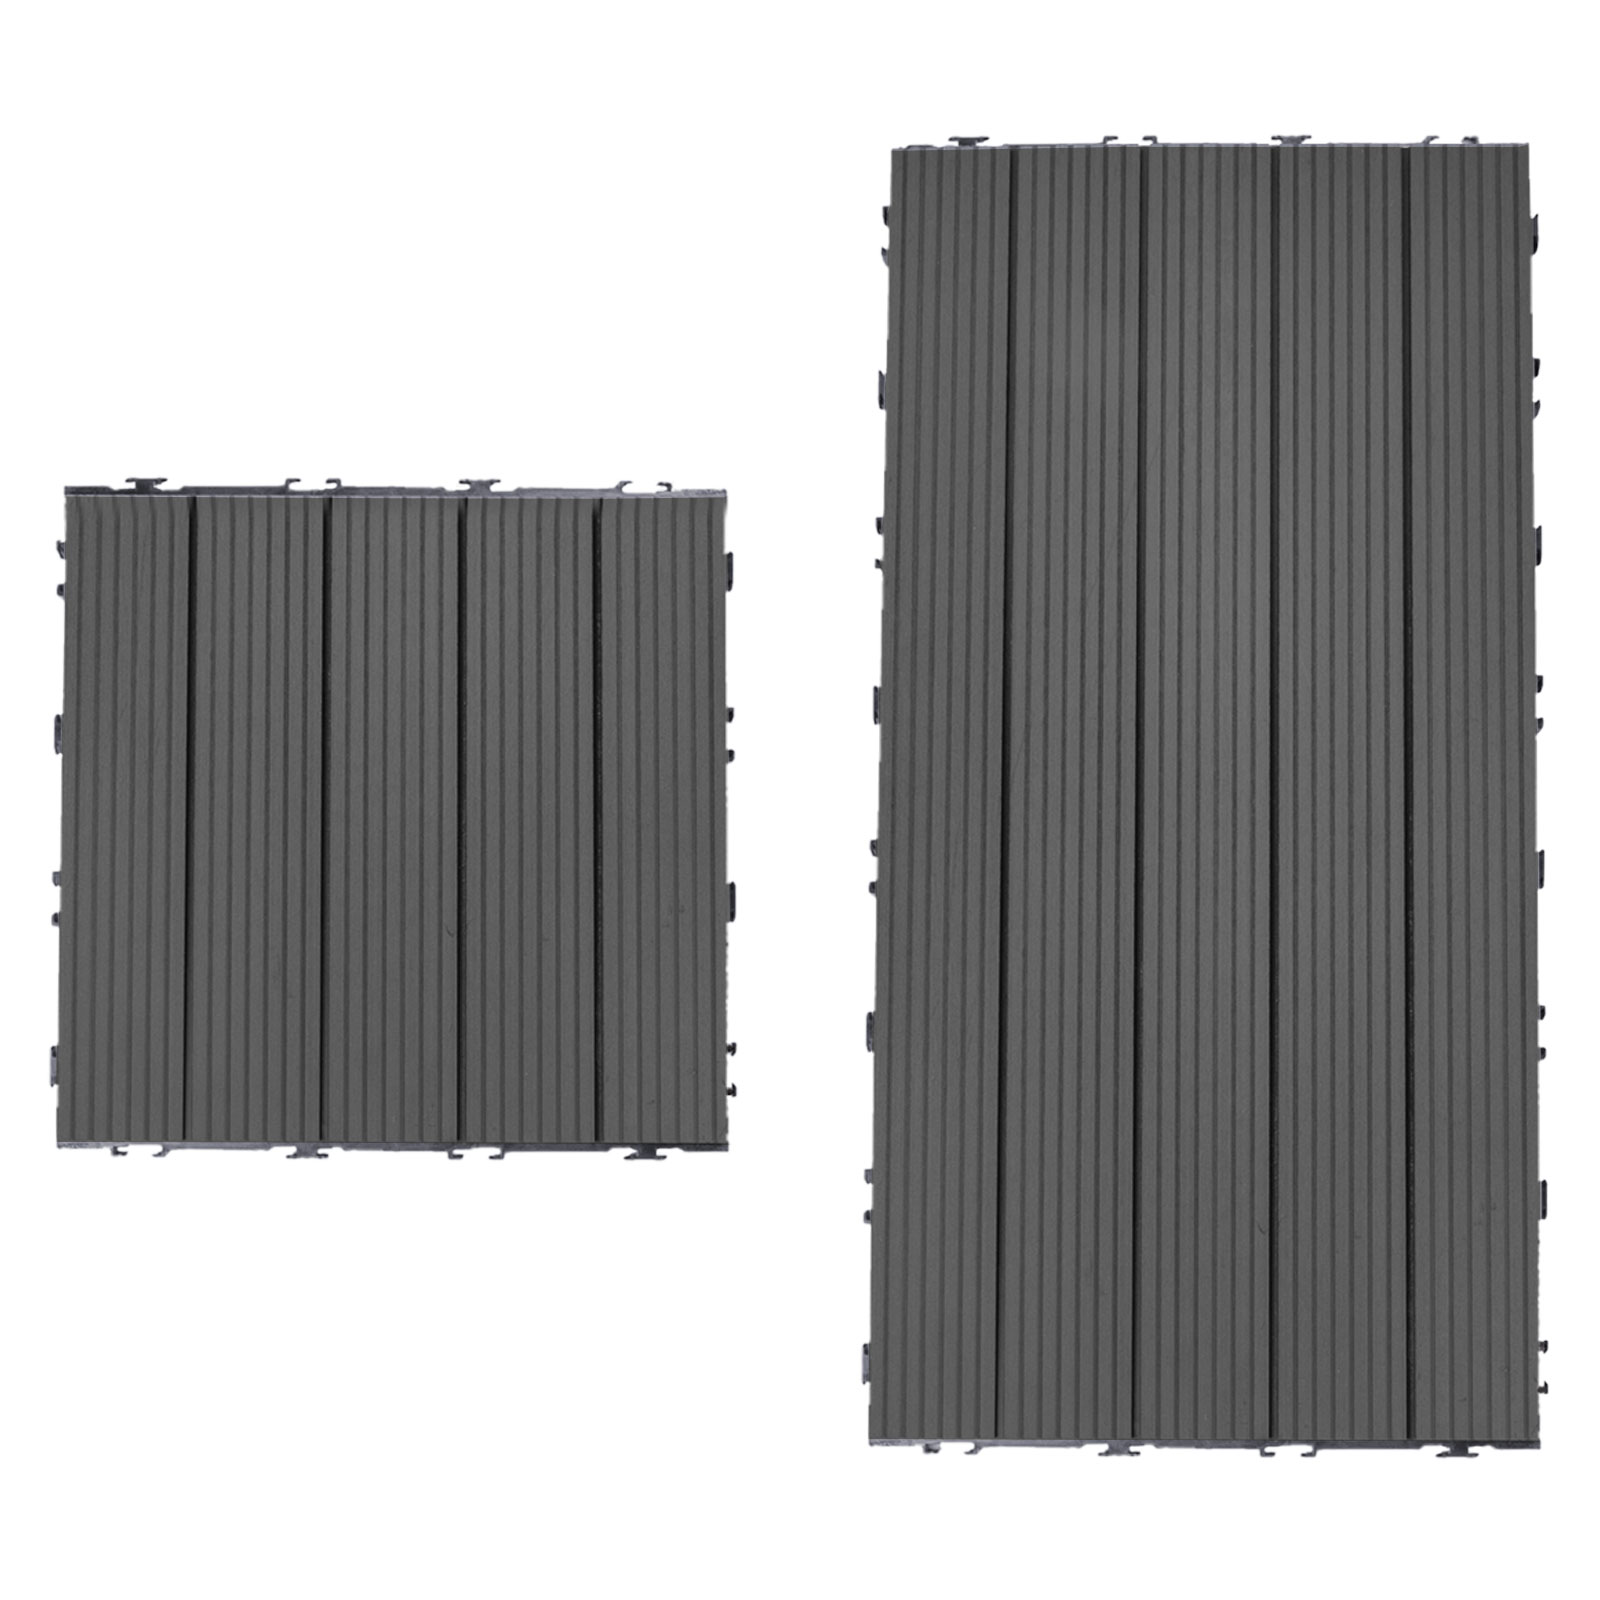 Terrassenfliesen-WPC-Klickfliesen-Balkonfliese-Holzfliese-Kunststoff Indexbild 2